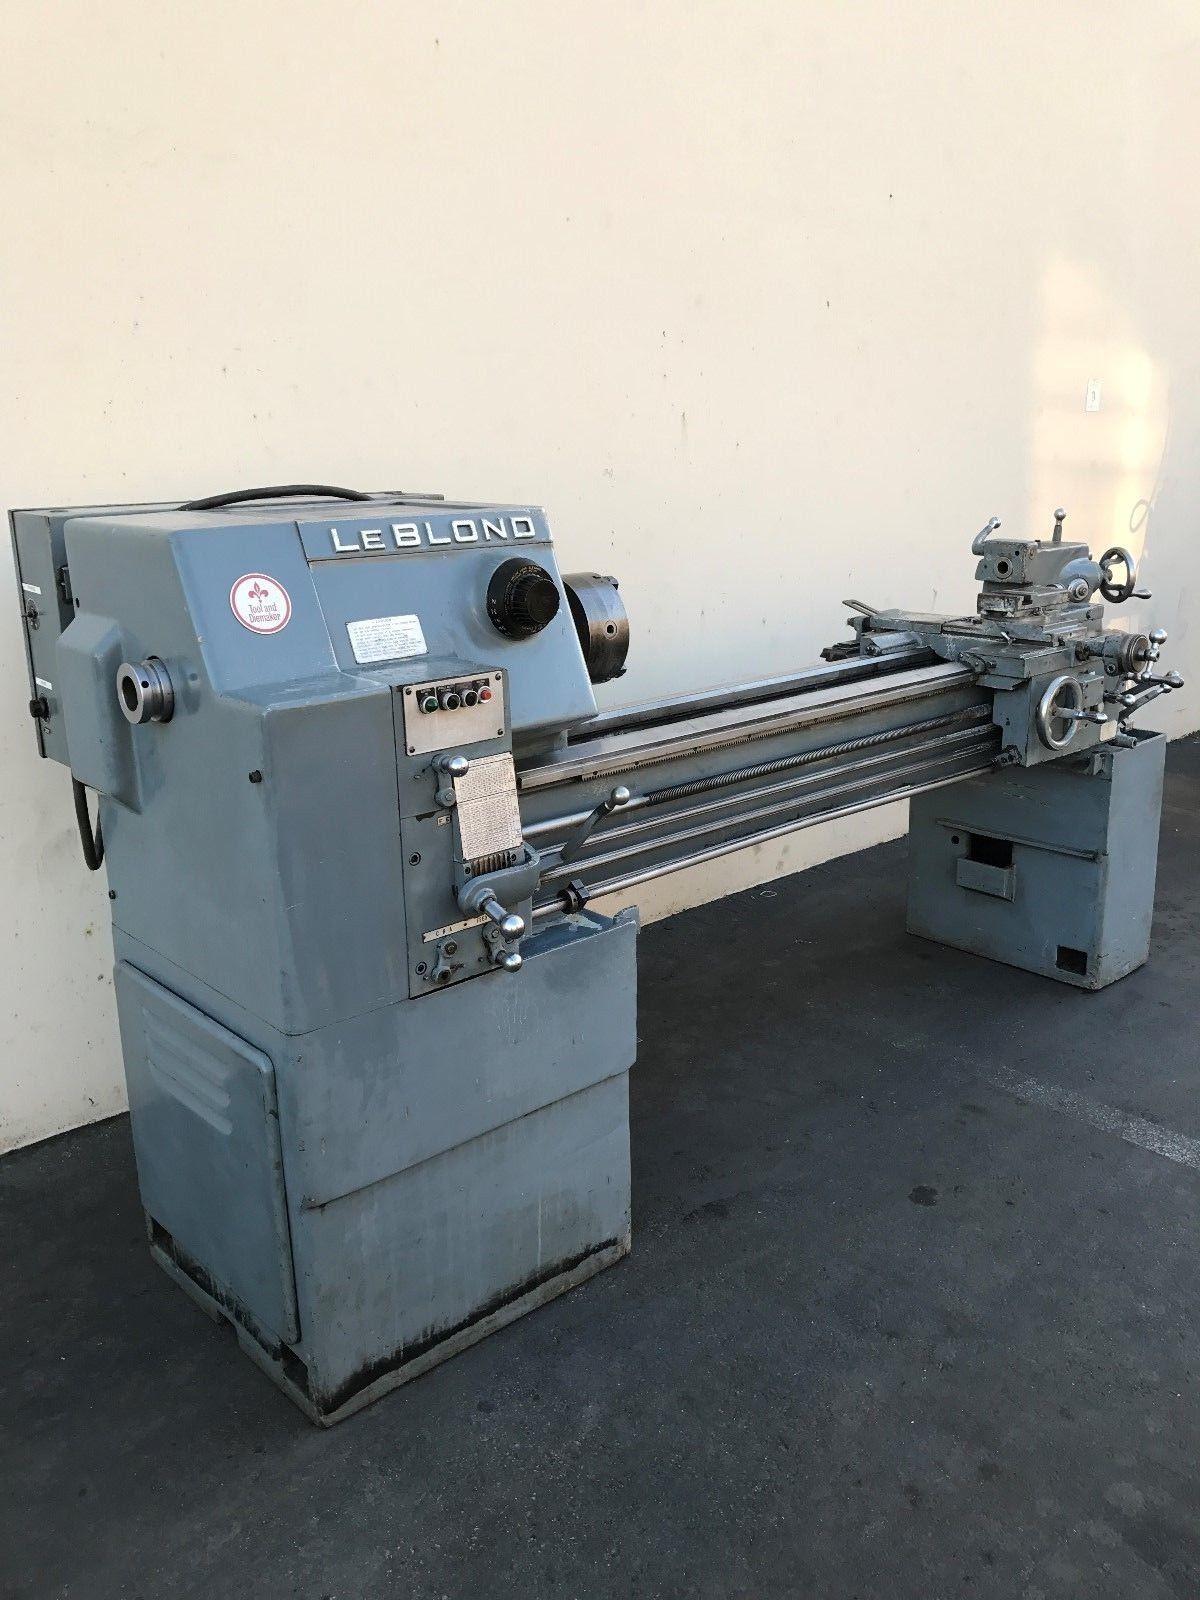 leblond-tool-die-maker-14x54-lathe - MachineStation